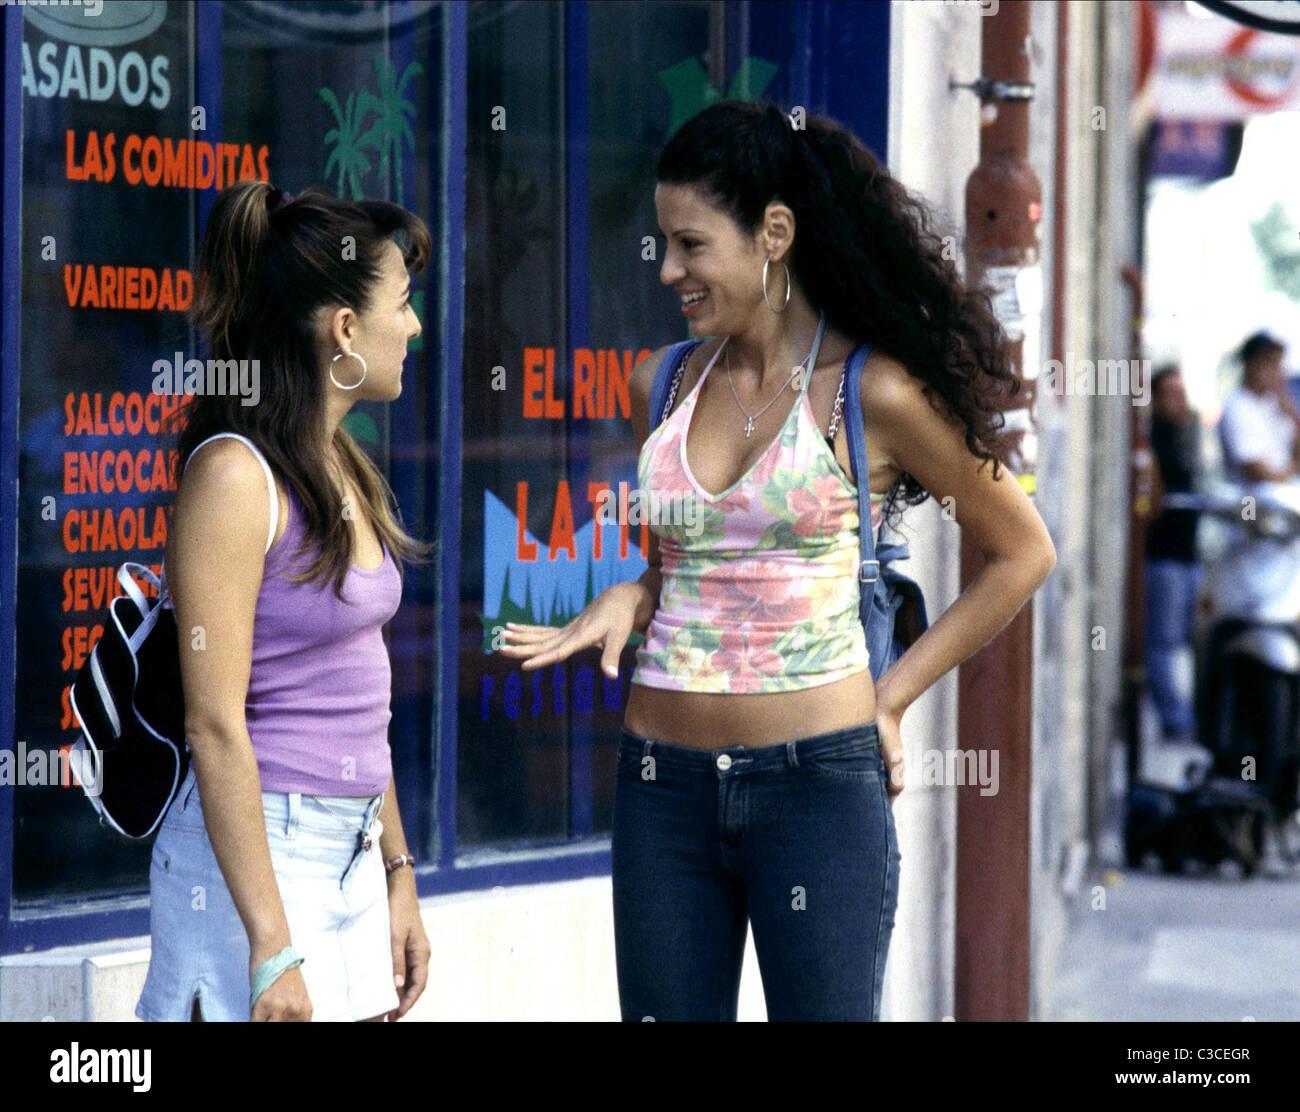 CANDELA PENA & MICAELA NEVAREZ PRINCESAS (2005) - Stock Image